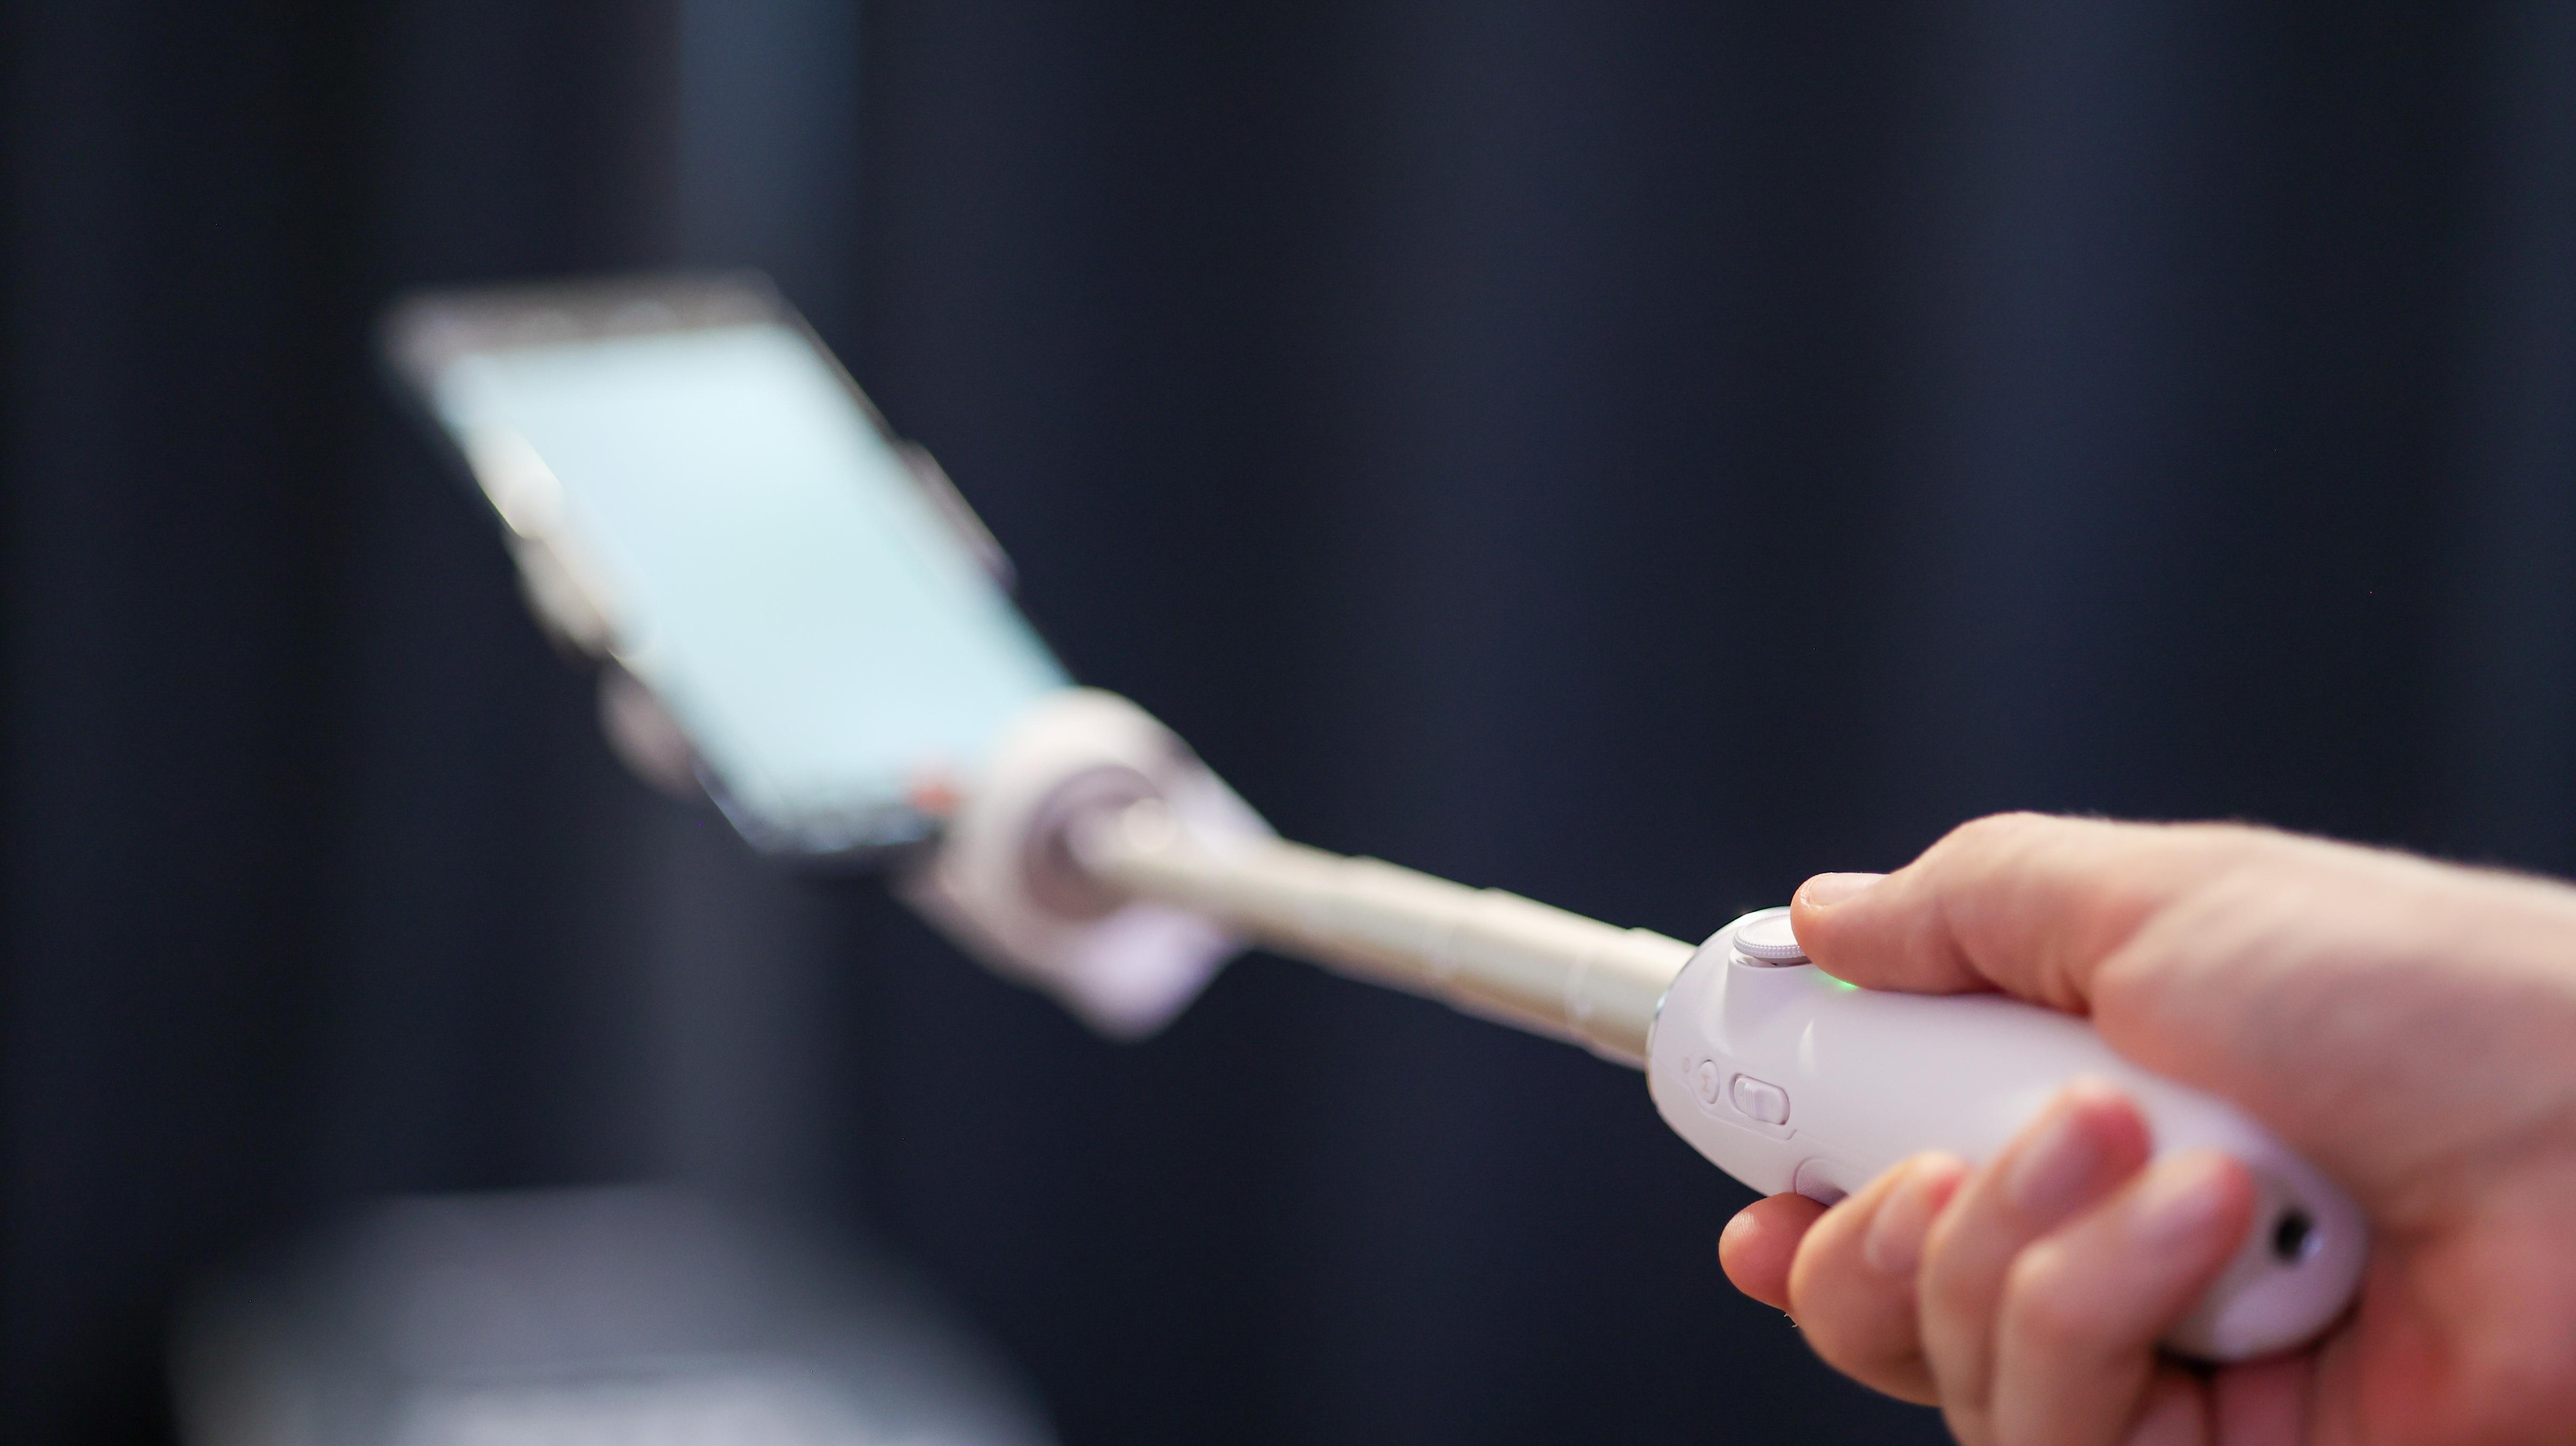 A hand holding the DJI OM 5 phone gimbal